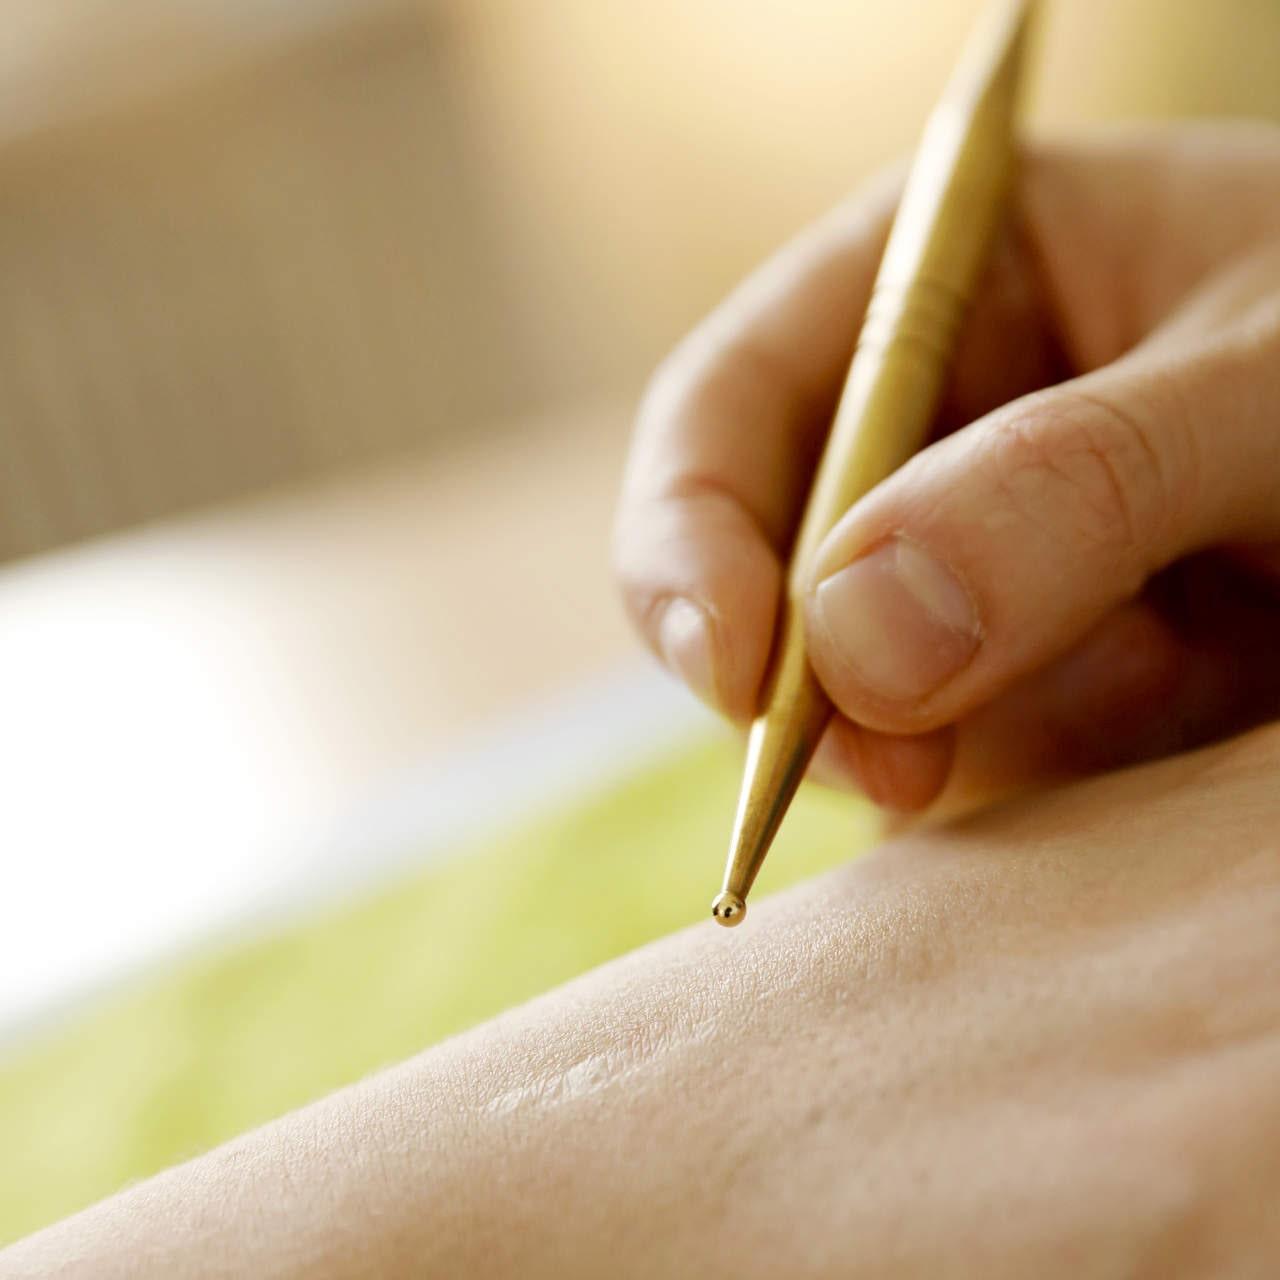 Narbenbehandlung an einer Hand